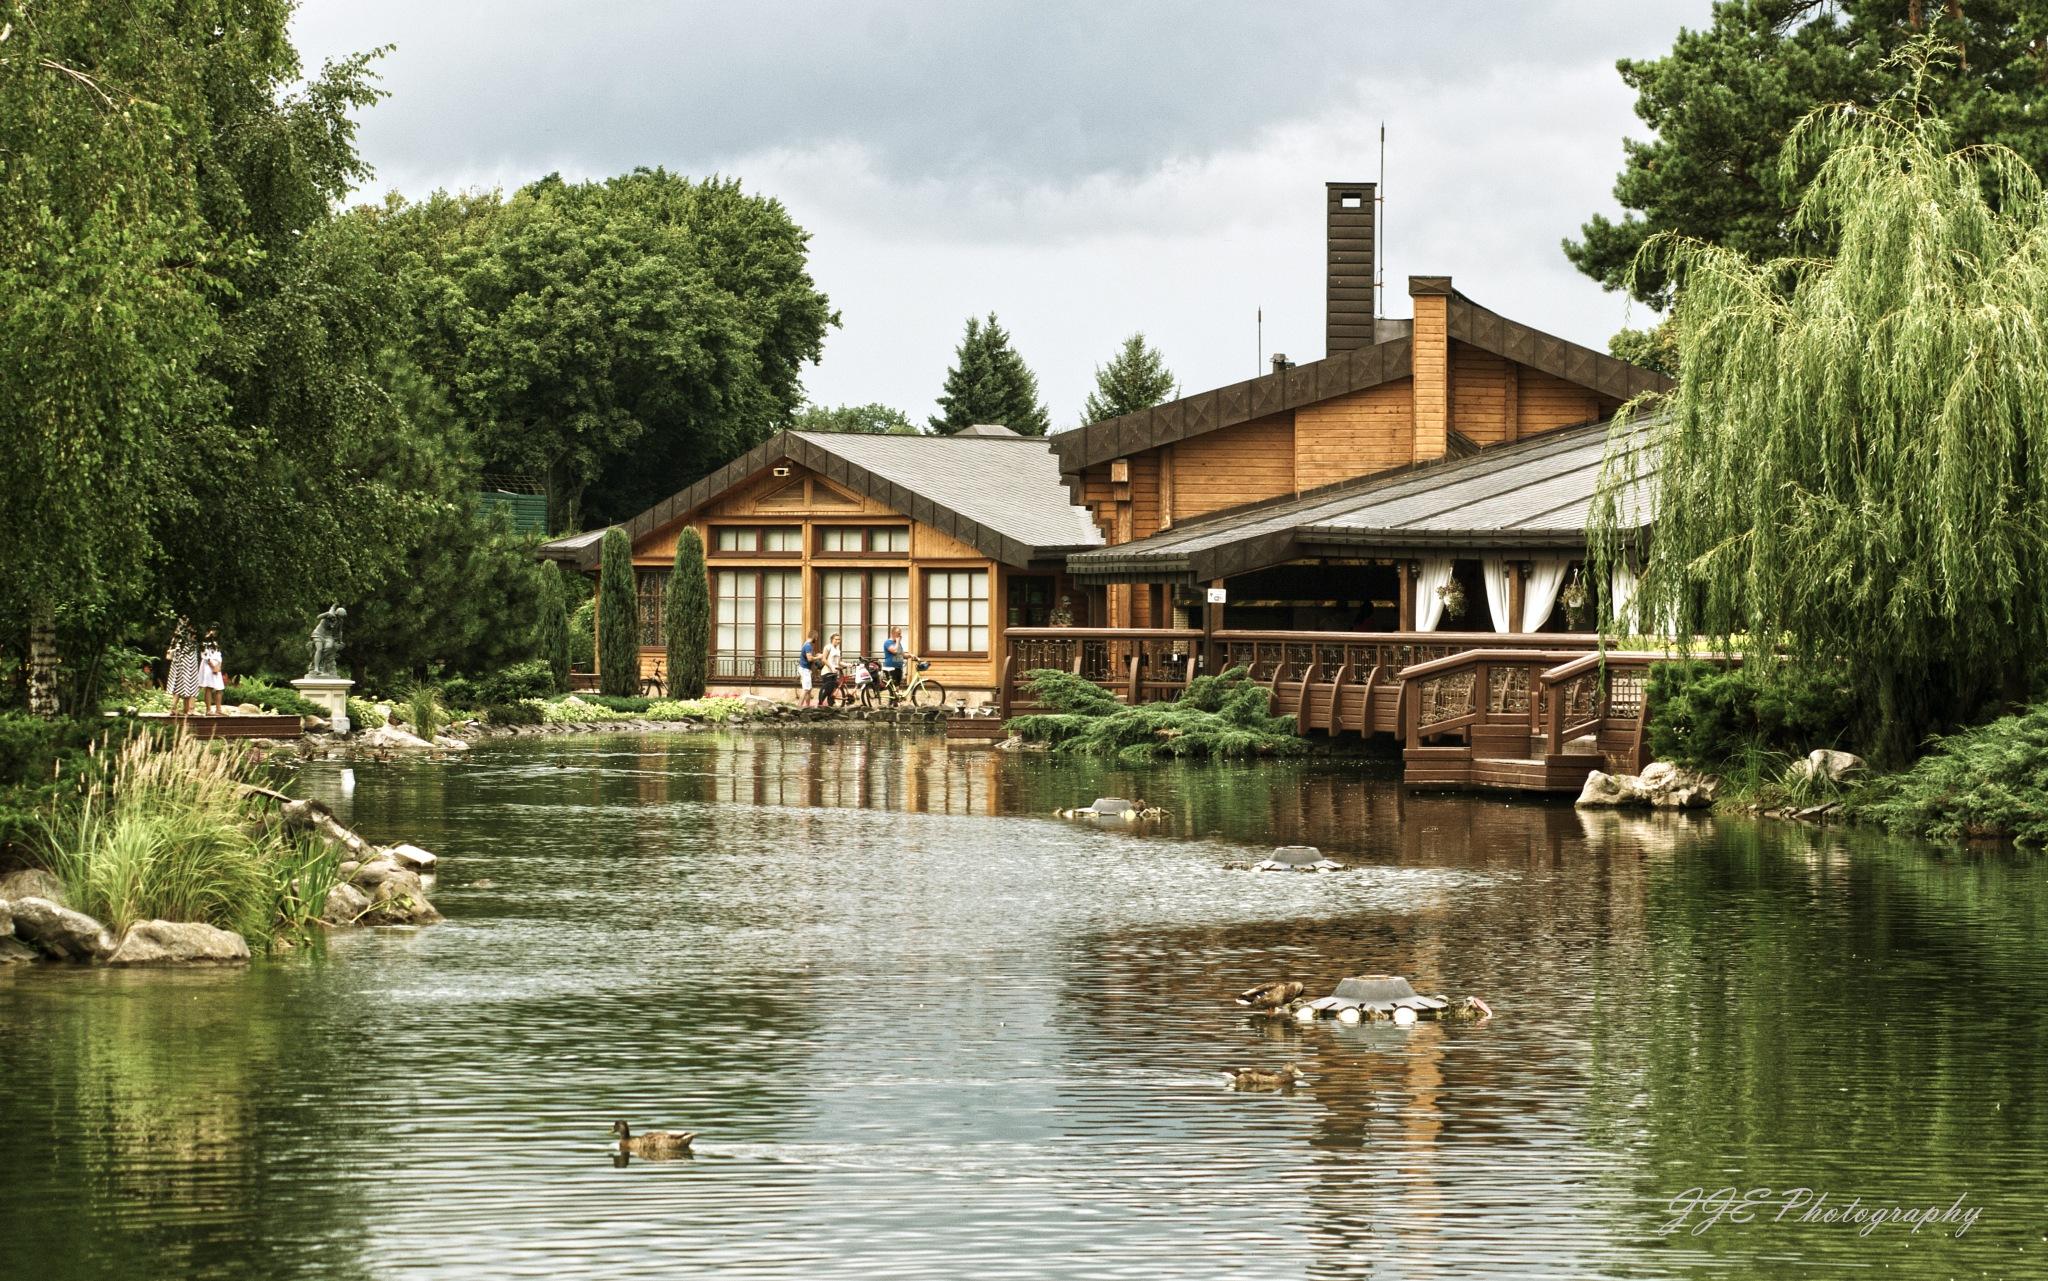 The house by the pond by jassaj